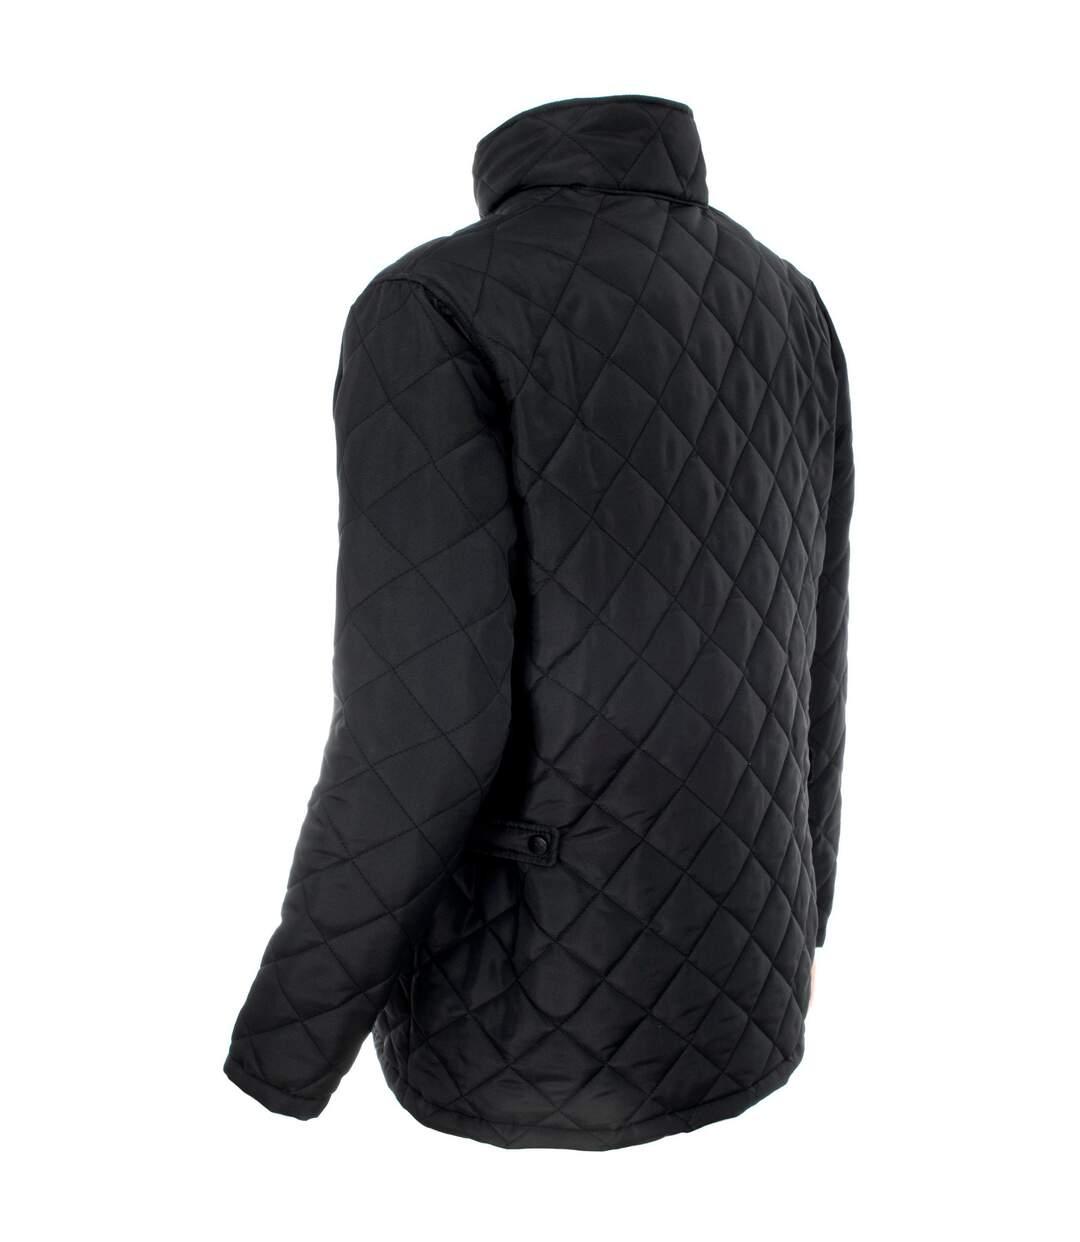 Trespass Mens Argyle Quilted Jacket (Black) - UTTP841